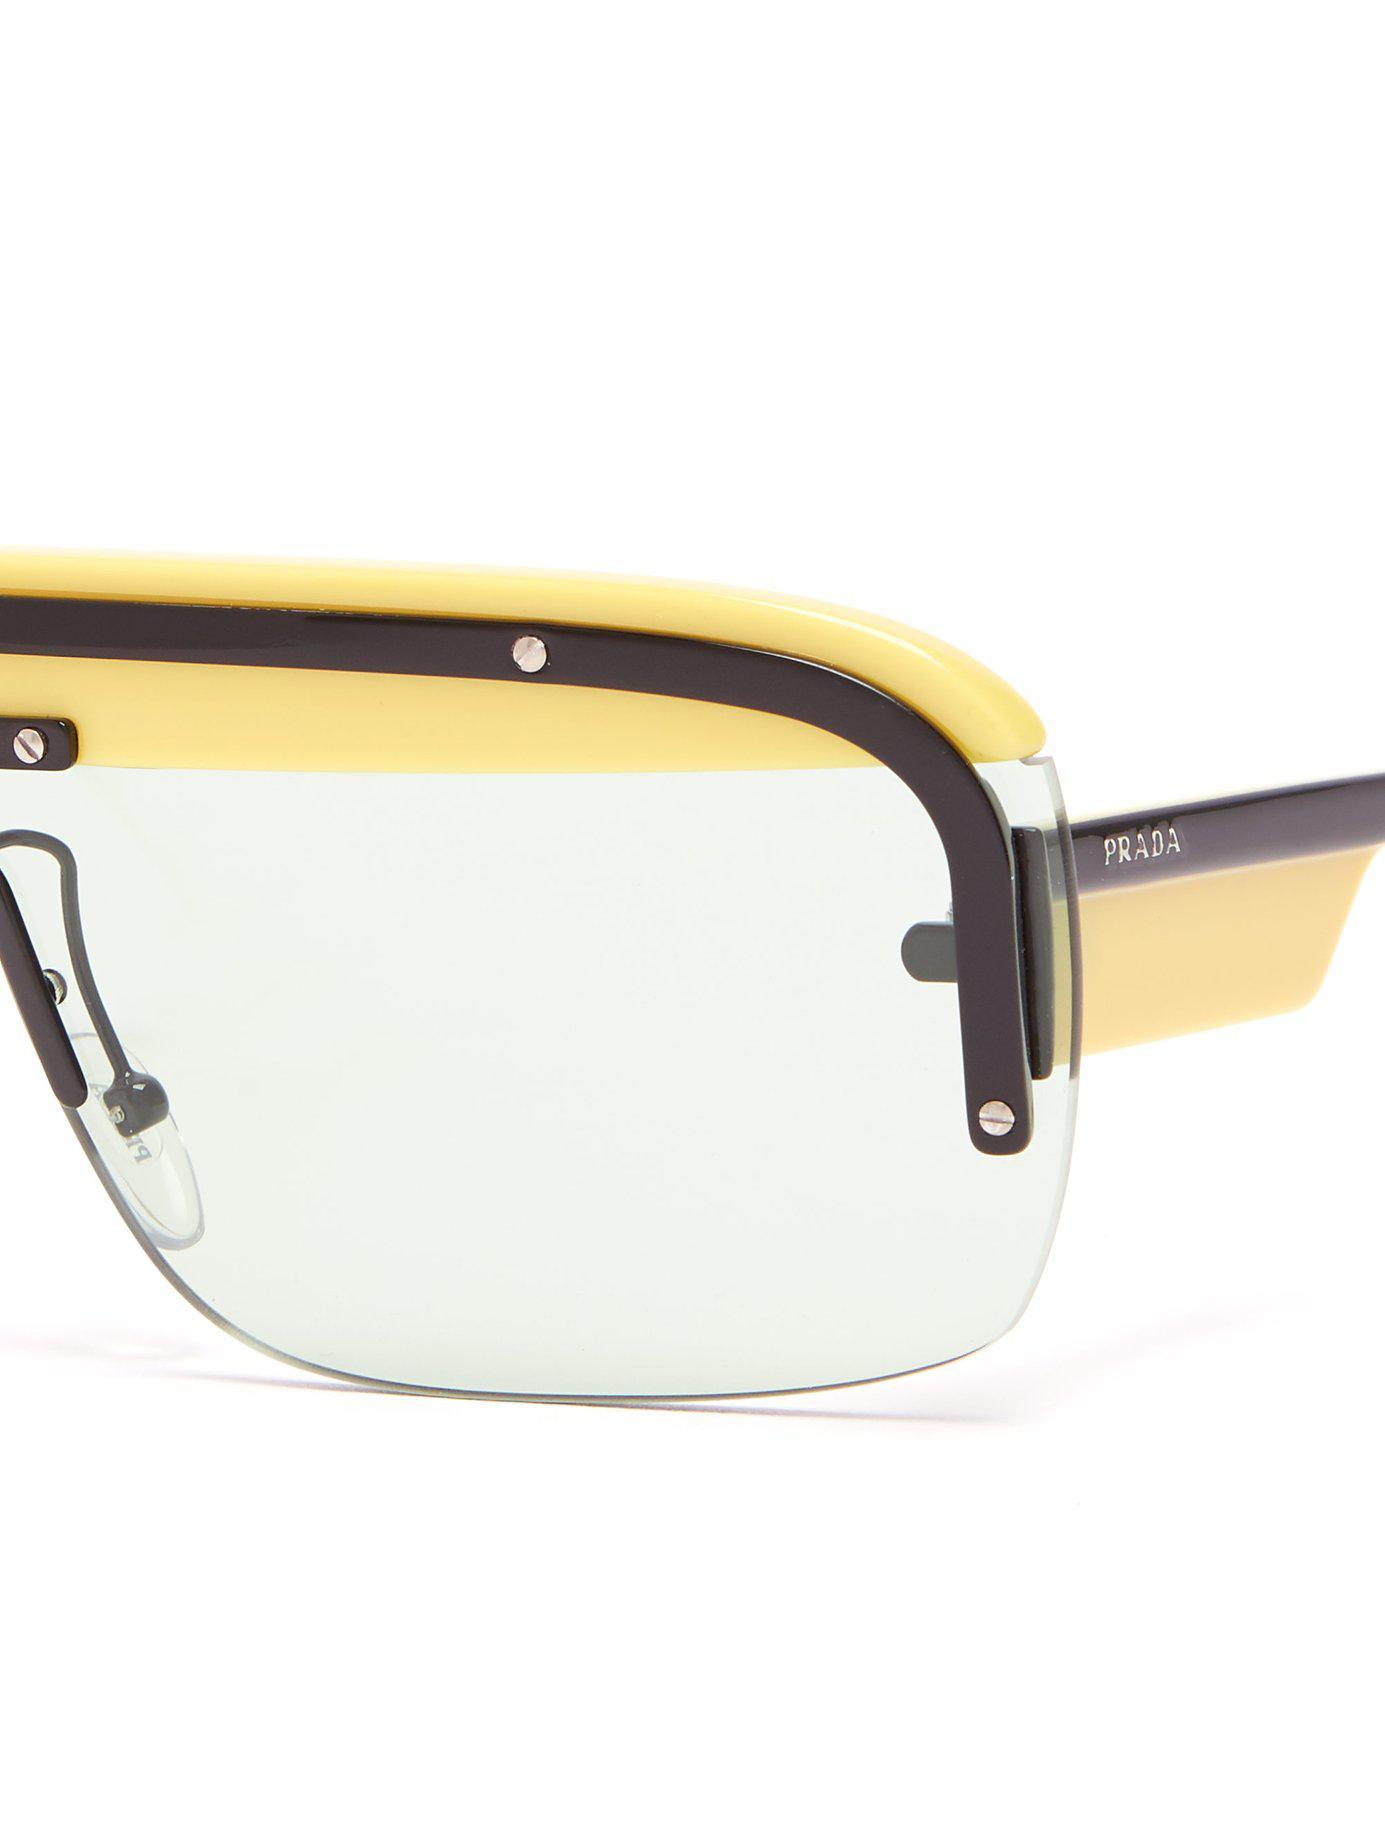 c84d8ee3e9b3 Lyst - Prada Game D Frame Acetate Sunglasses in Yellow for Men